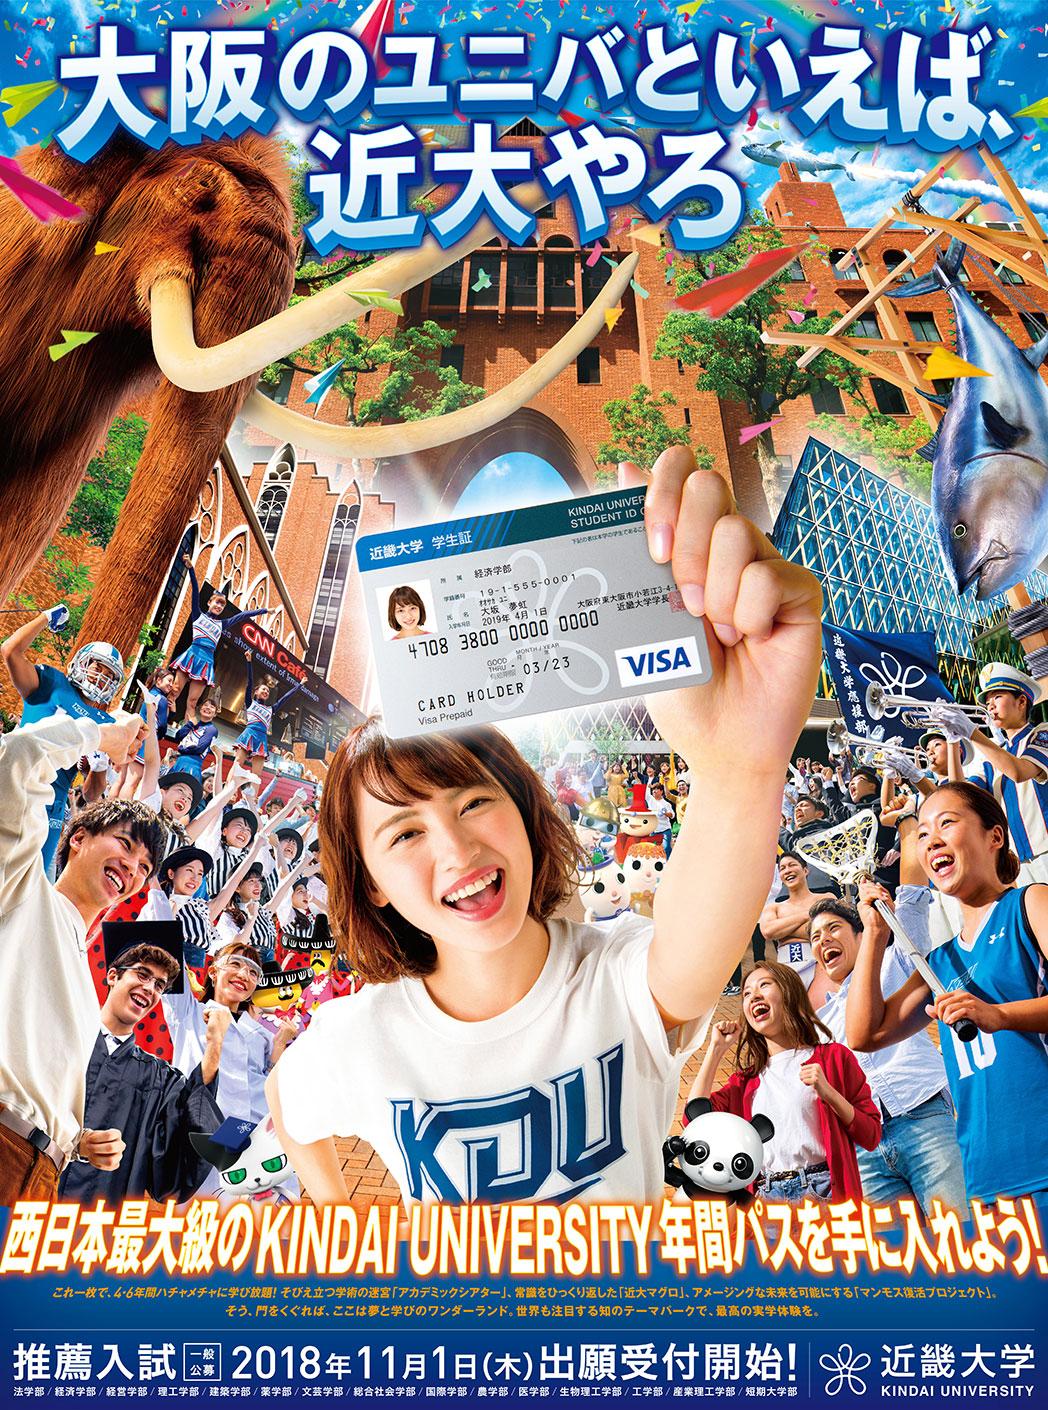 Unipa 大阪 芸大